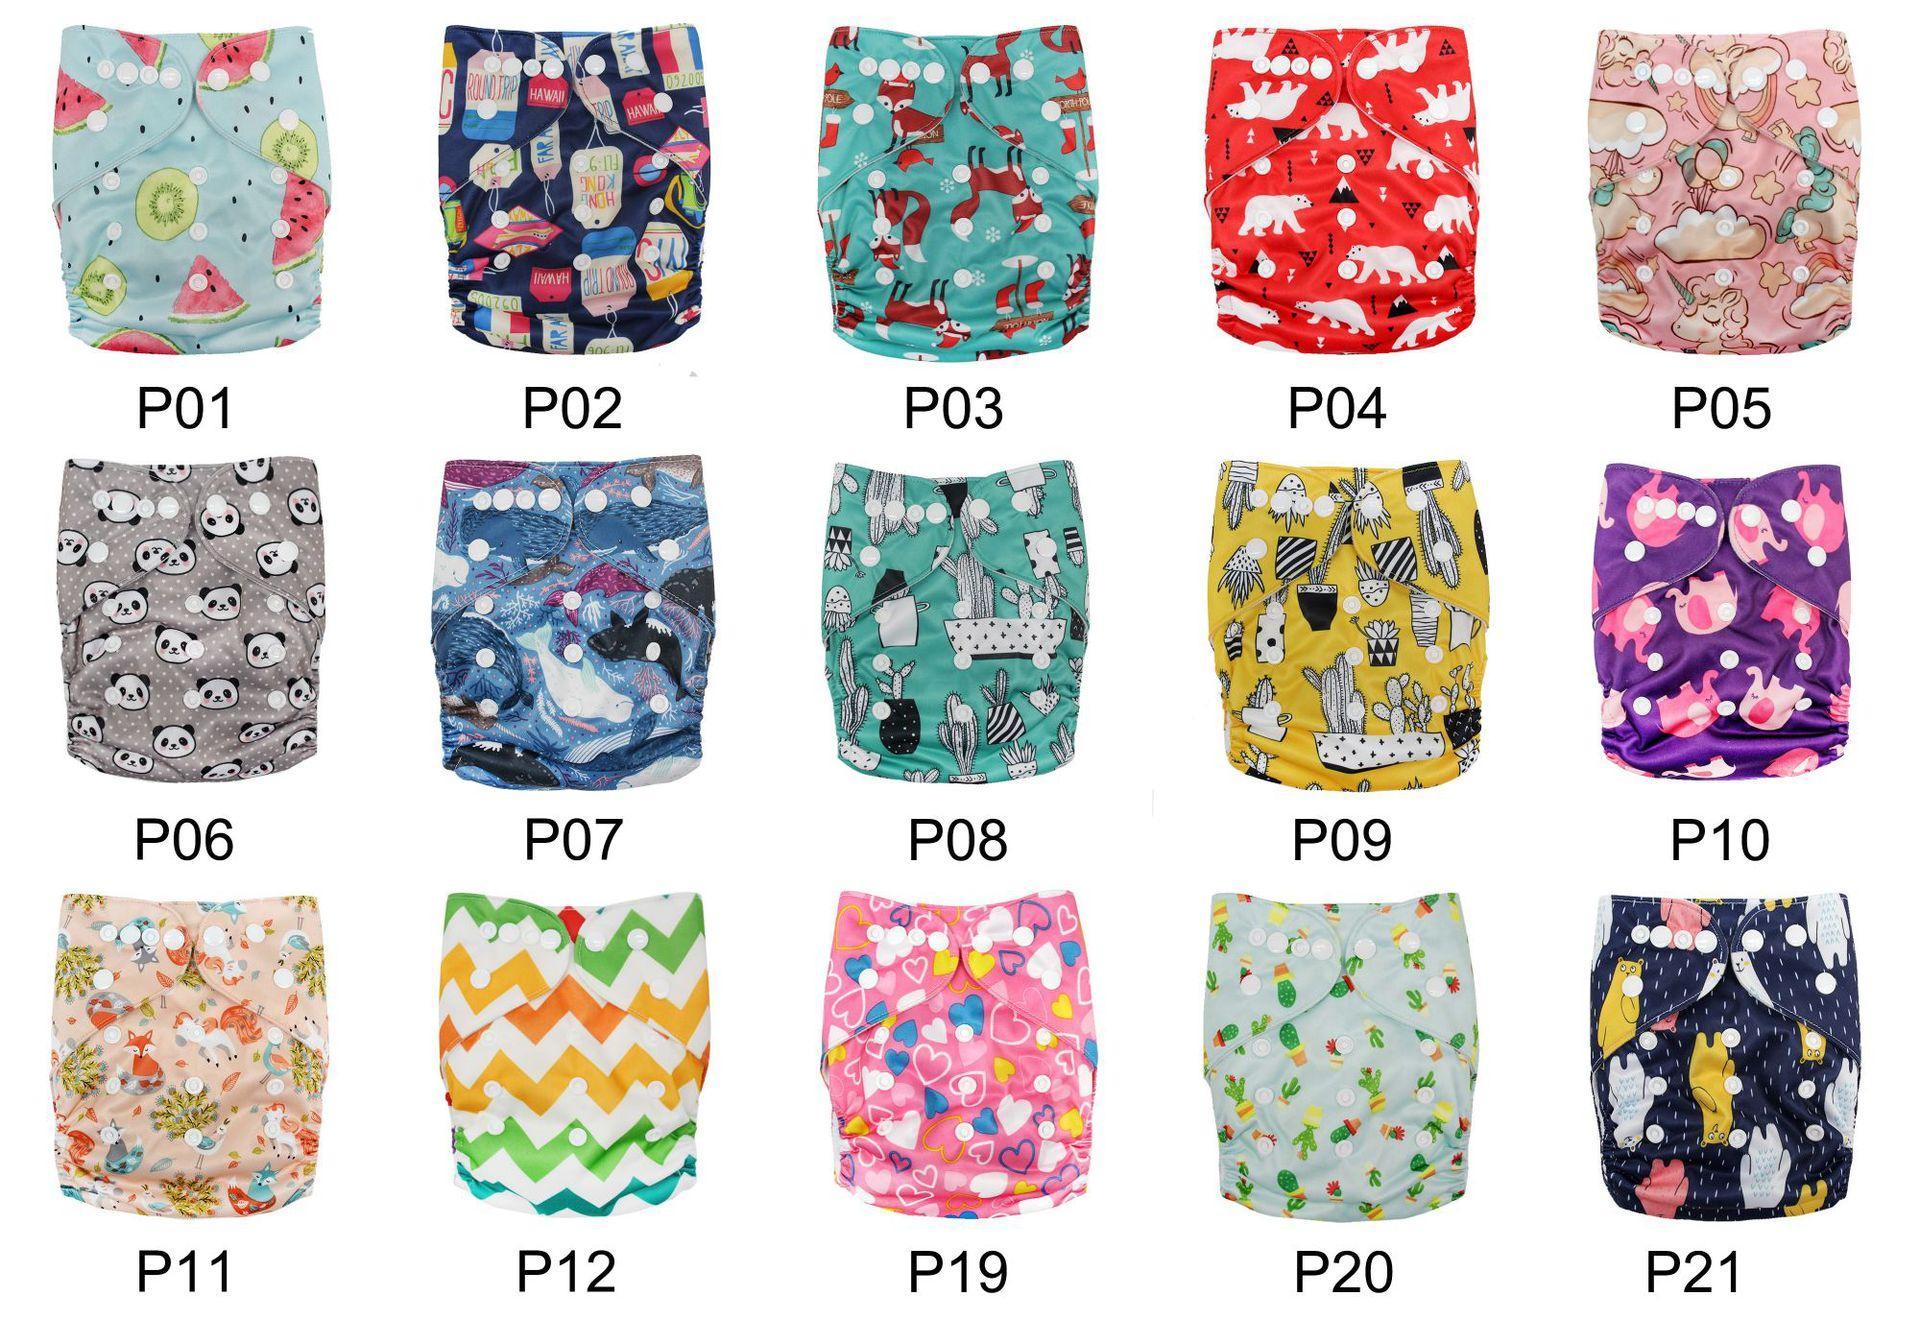 [LittlesBloomz] Baby lavável reutilizável real pano PADRÃO Gancho-Loop bolso Fralda Diaper incluir a Wrap, ternos nascimento para Potty